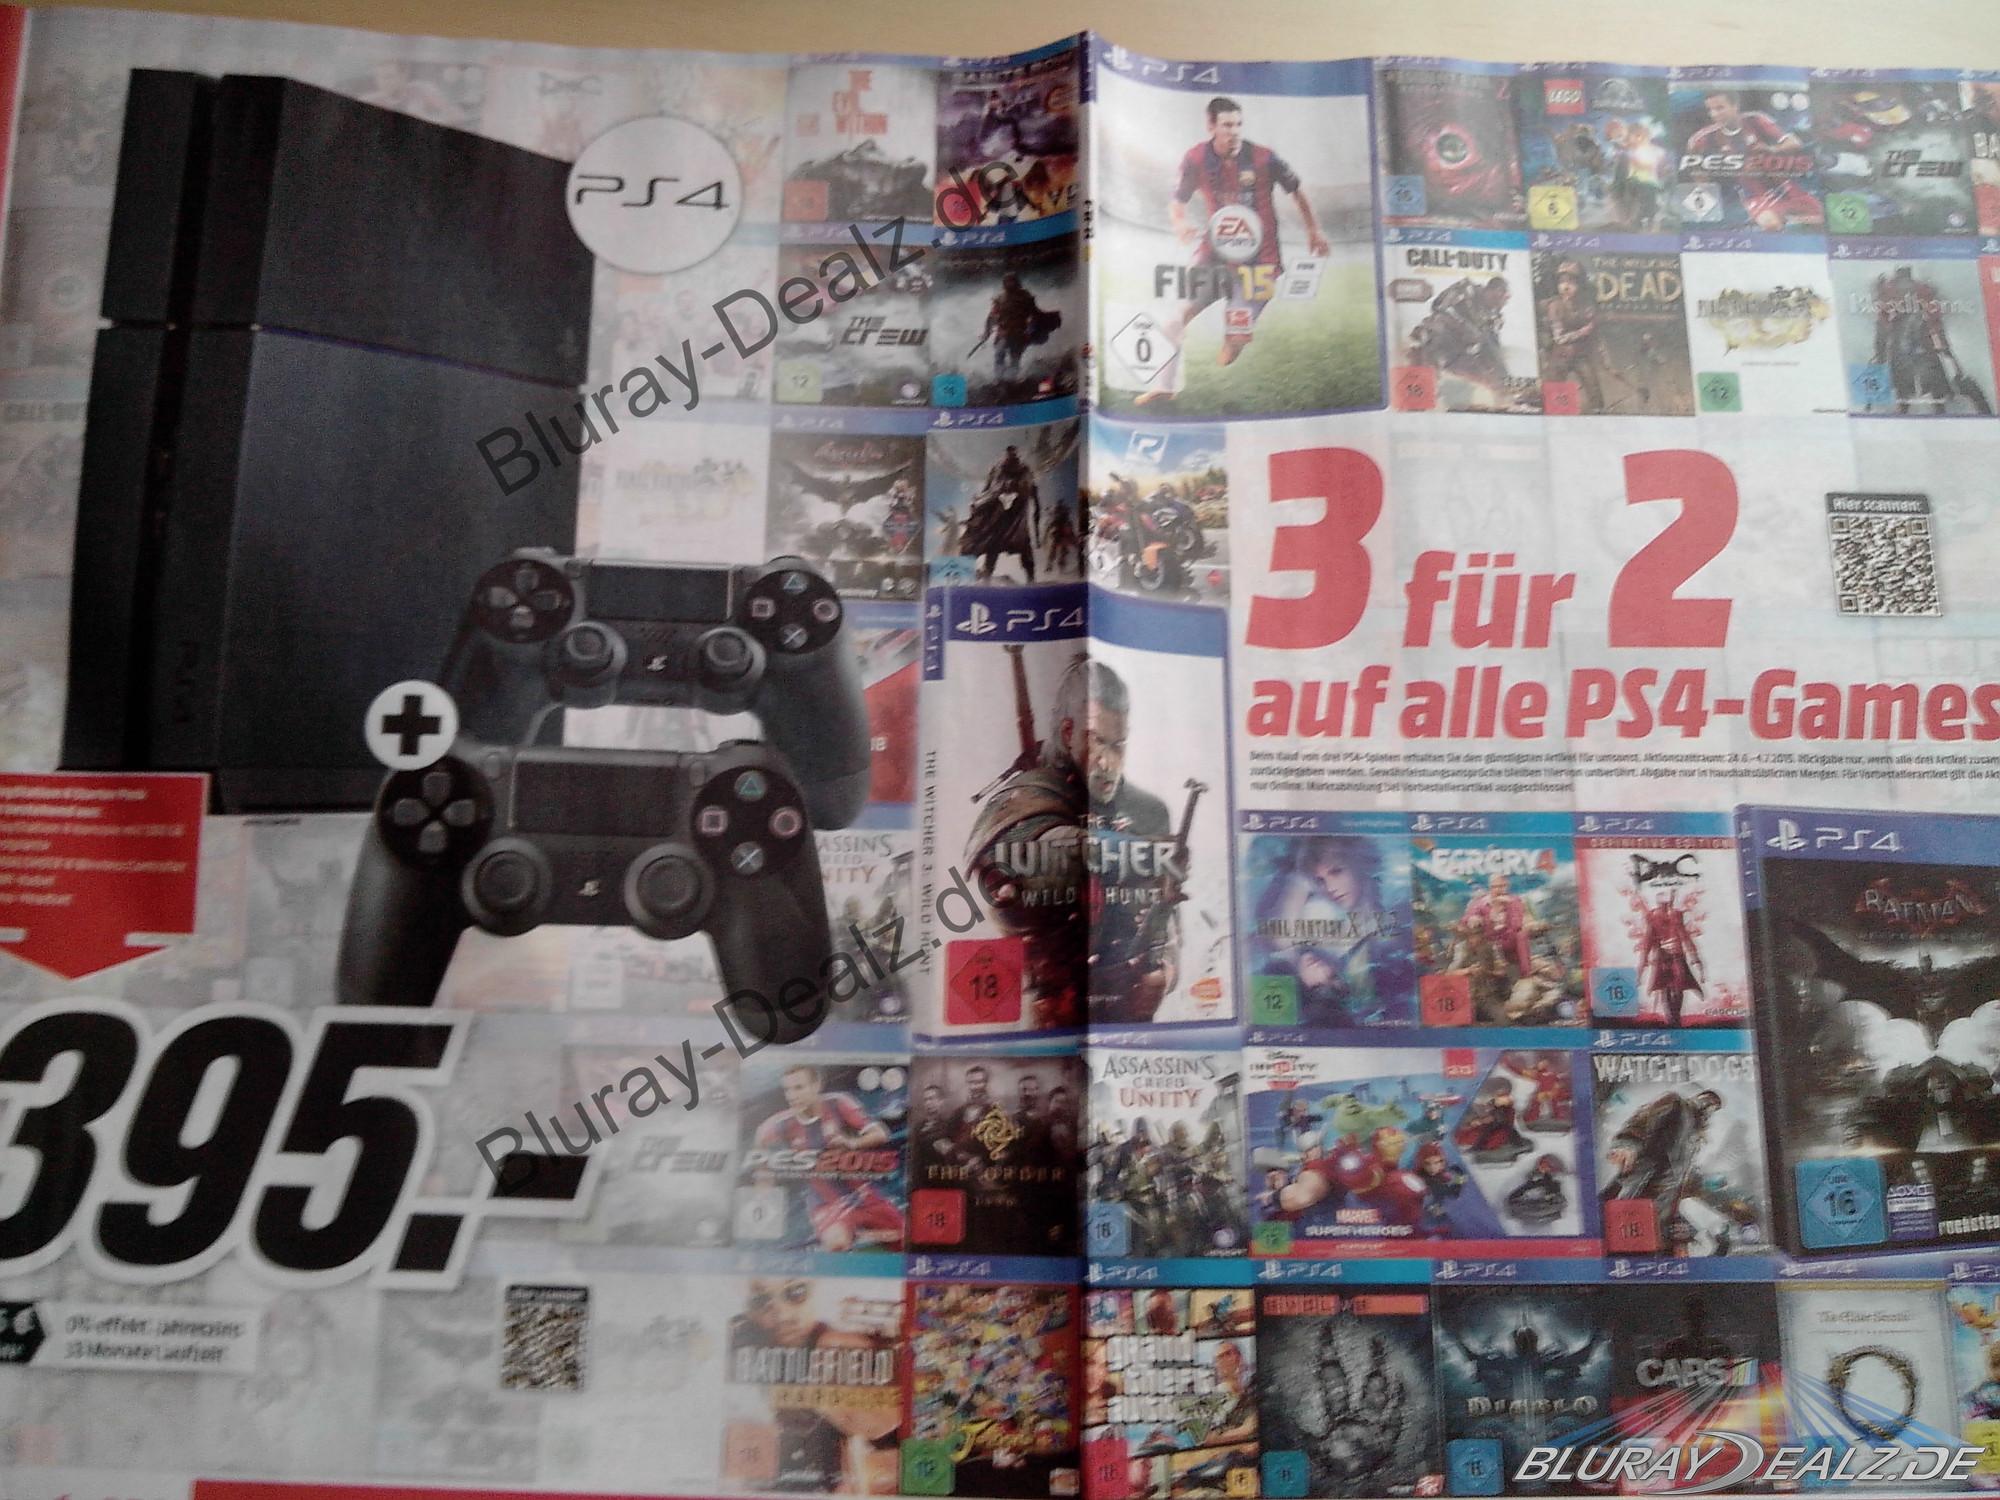 3-fuer-2-ps4-games-nat-games